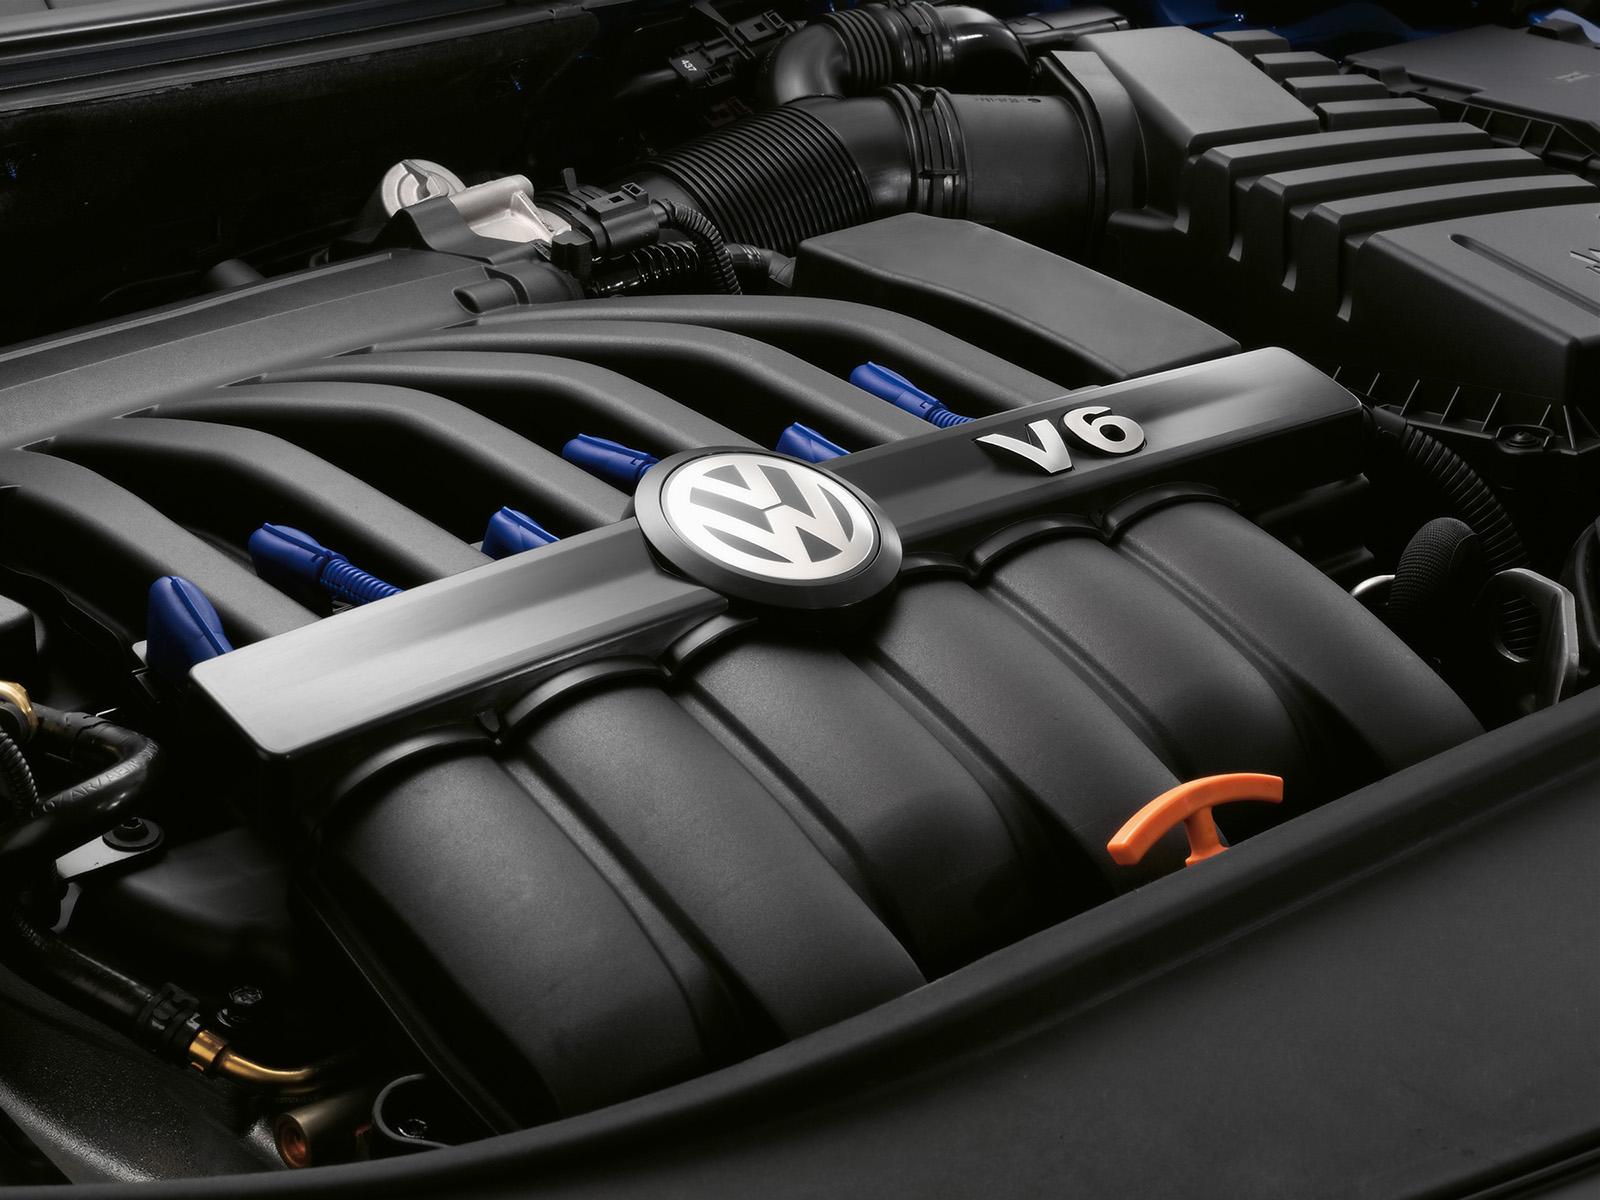 R36 motor